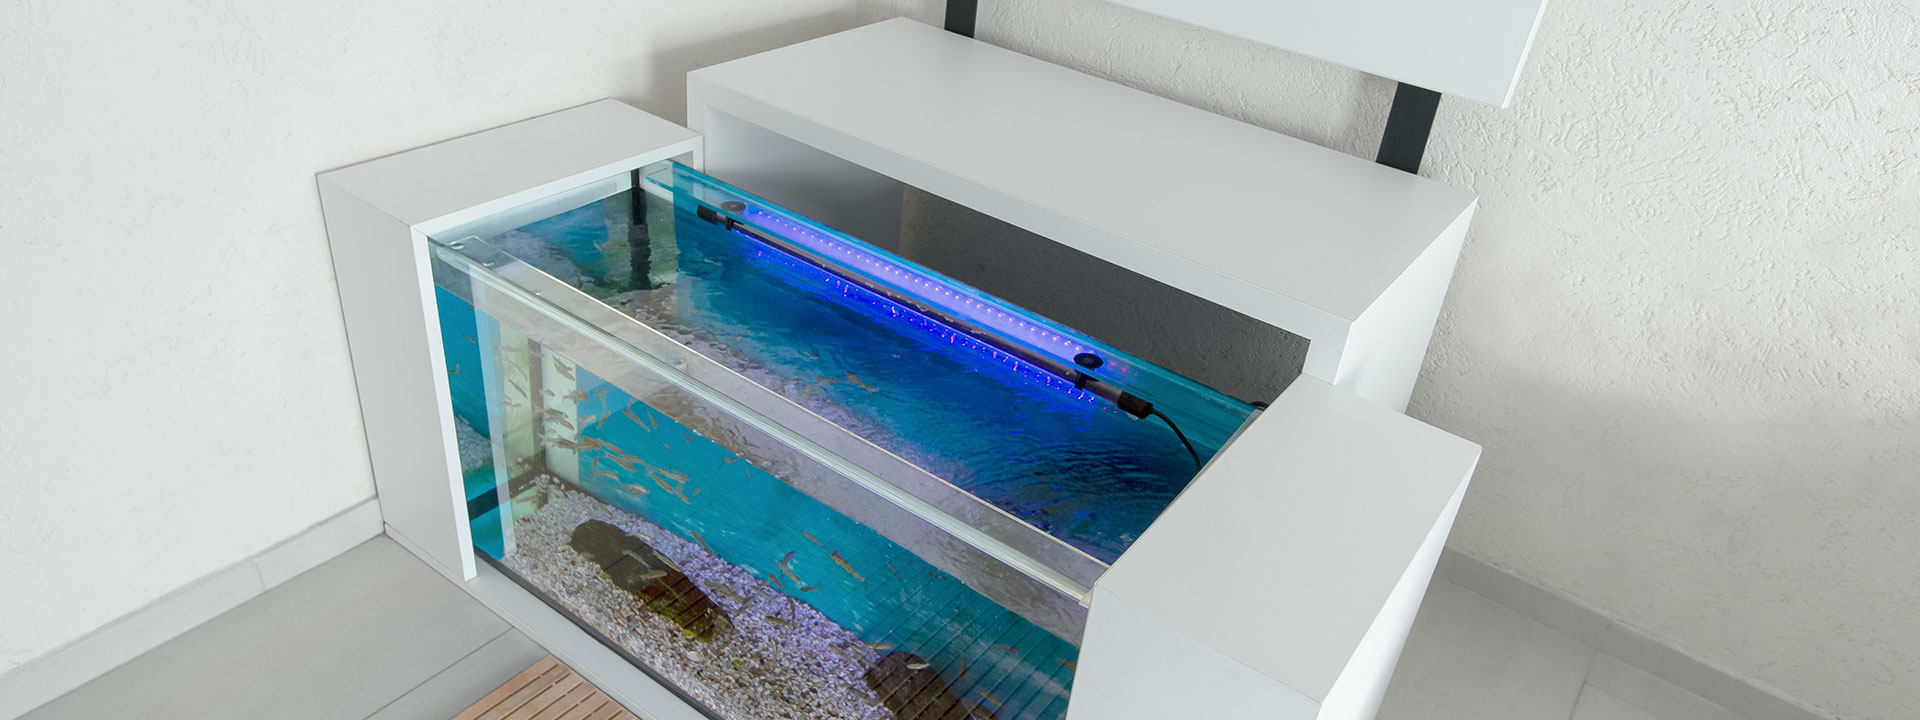 Knabber-Spa Design-Aquarien für Fischpediküre B2B